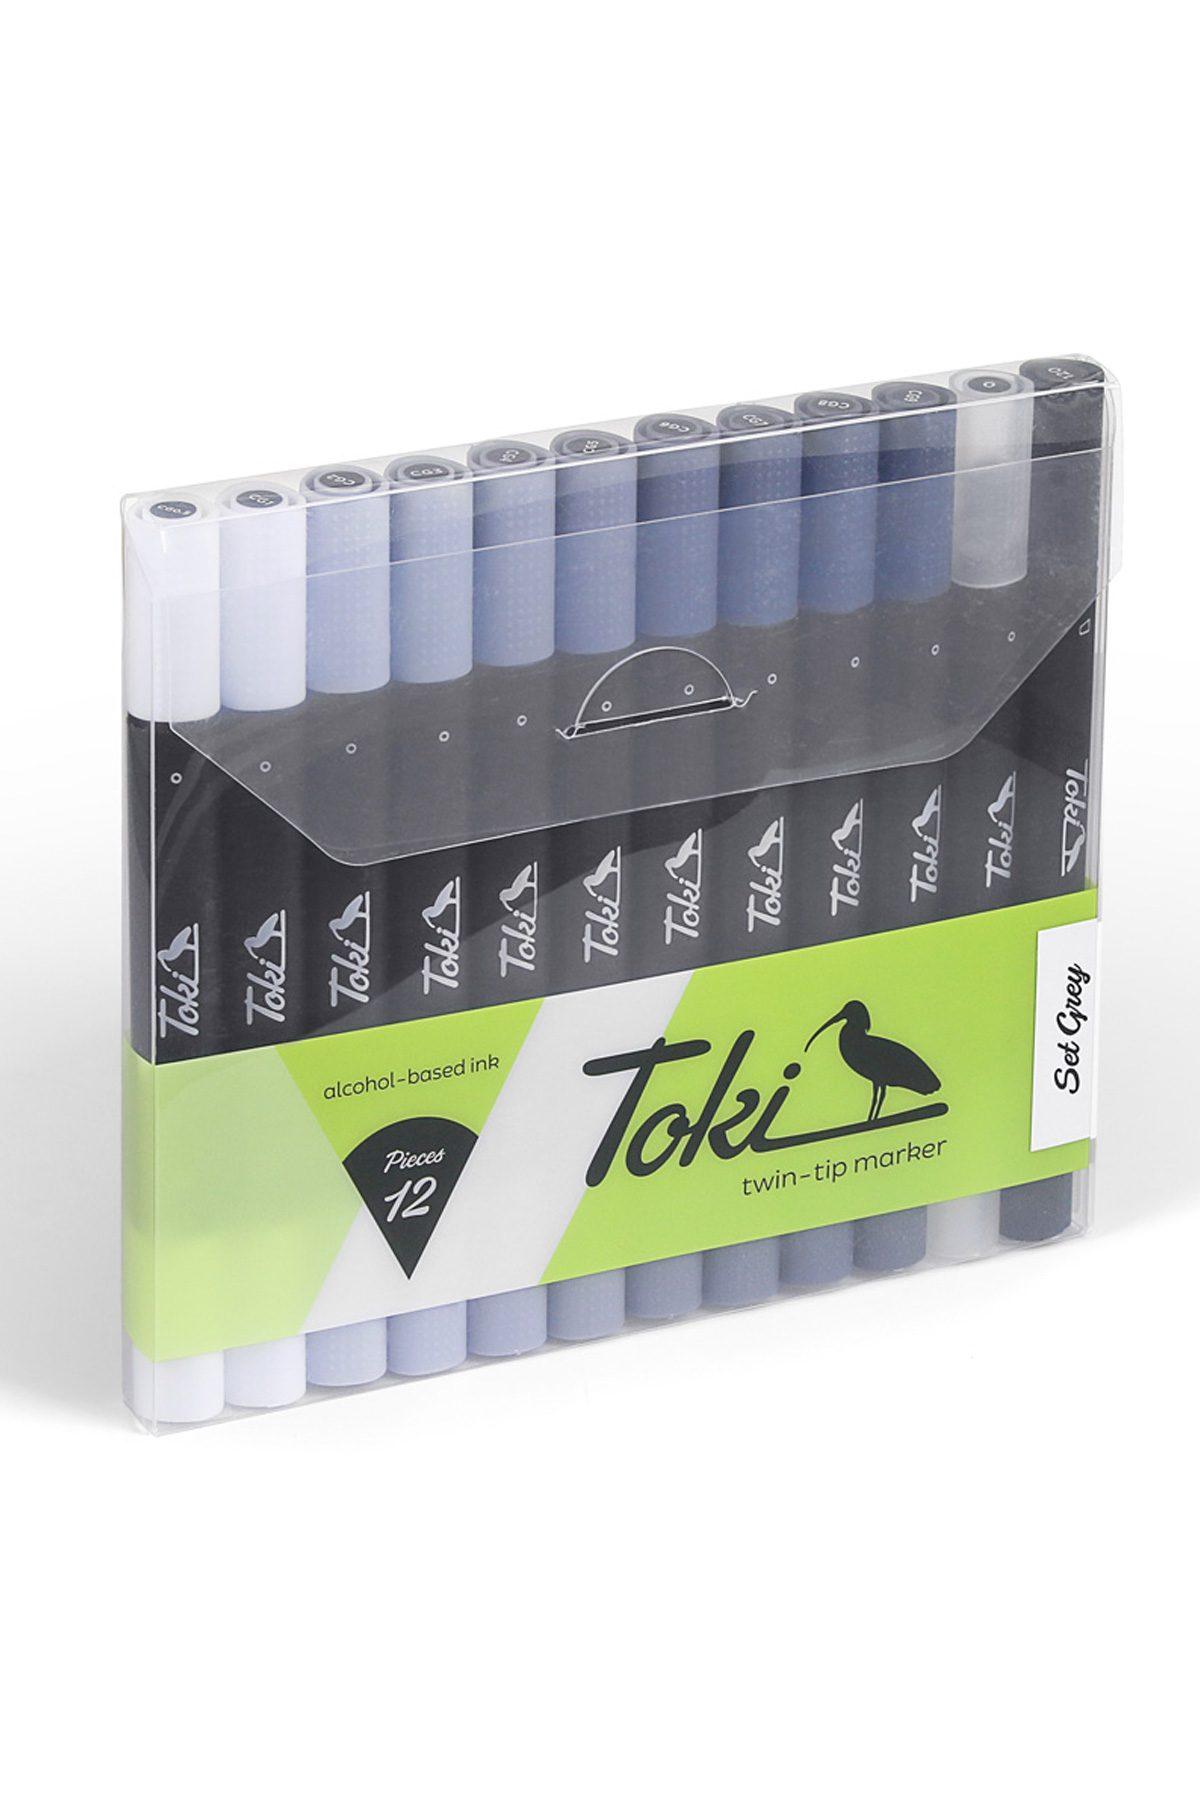 Toki LAYOUTMARKER 12 Set Grey